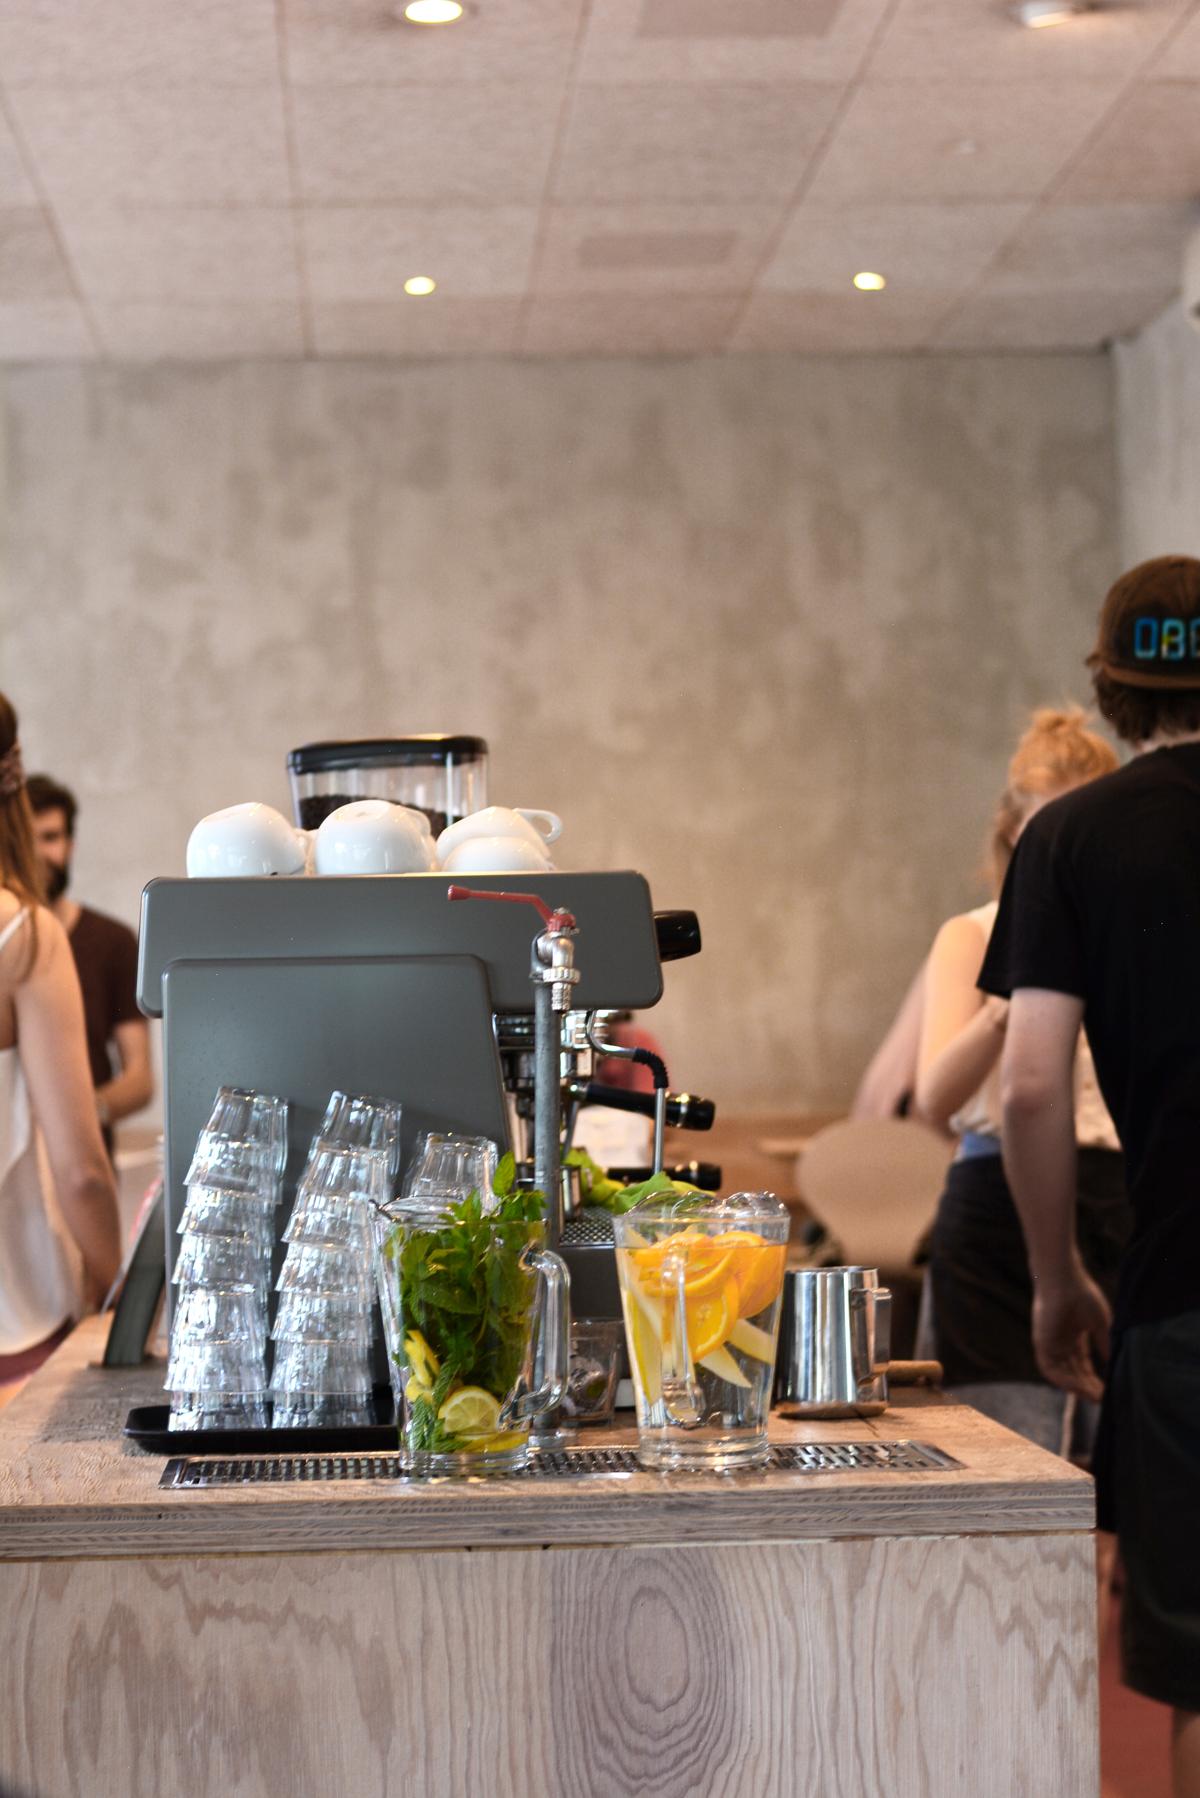 Tribeka Kaffeehaus | Pixi mit Milch